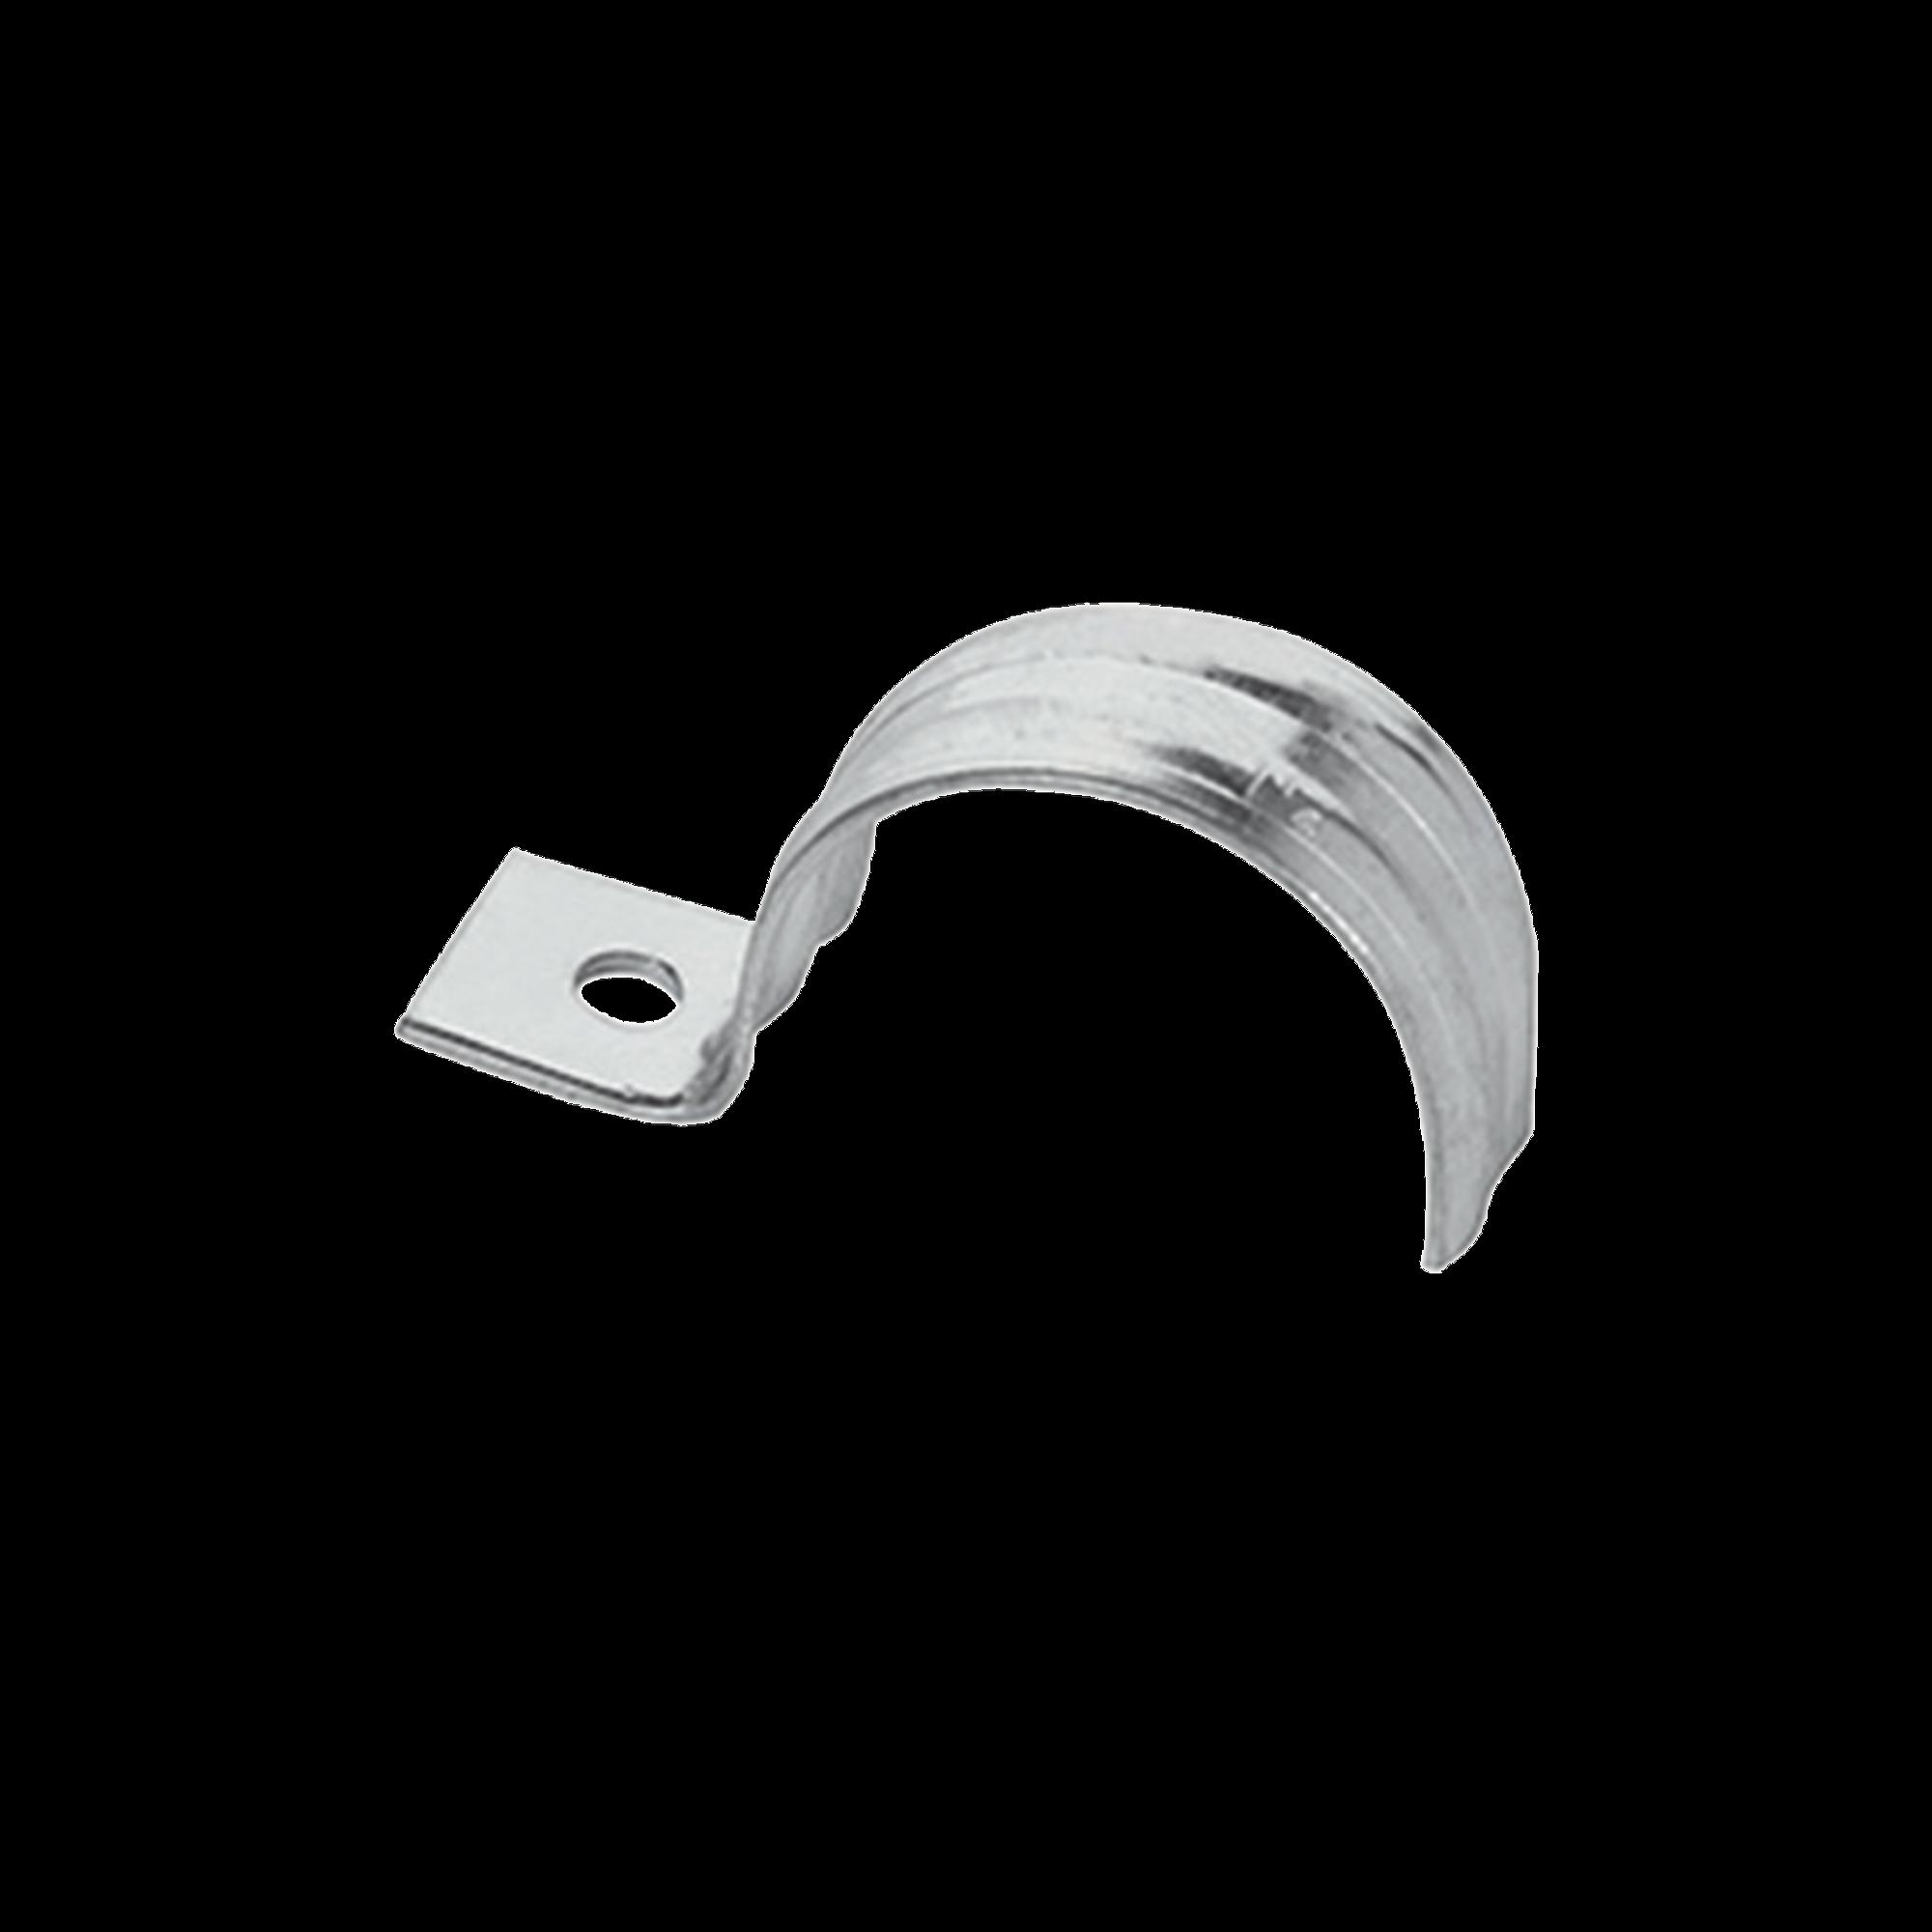 Abrazadera para tubo tipo uña 3/4 bolsa con 10 piezas